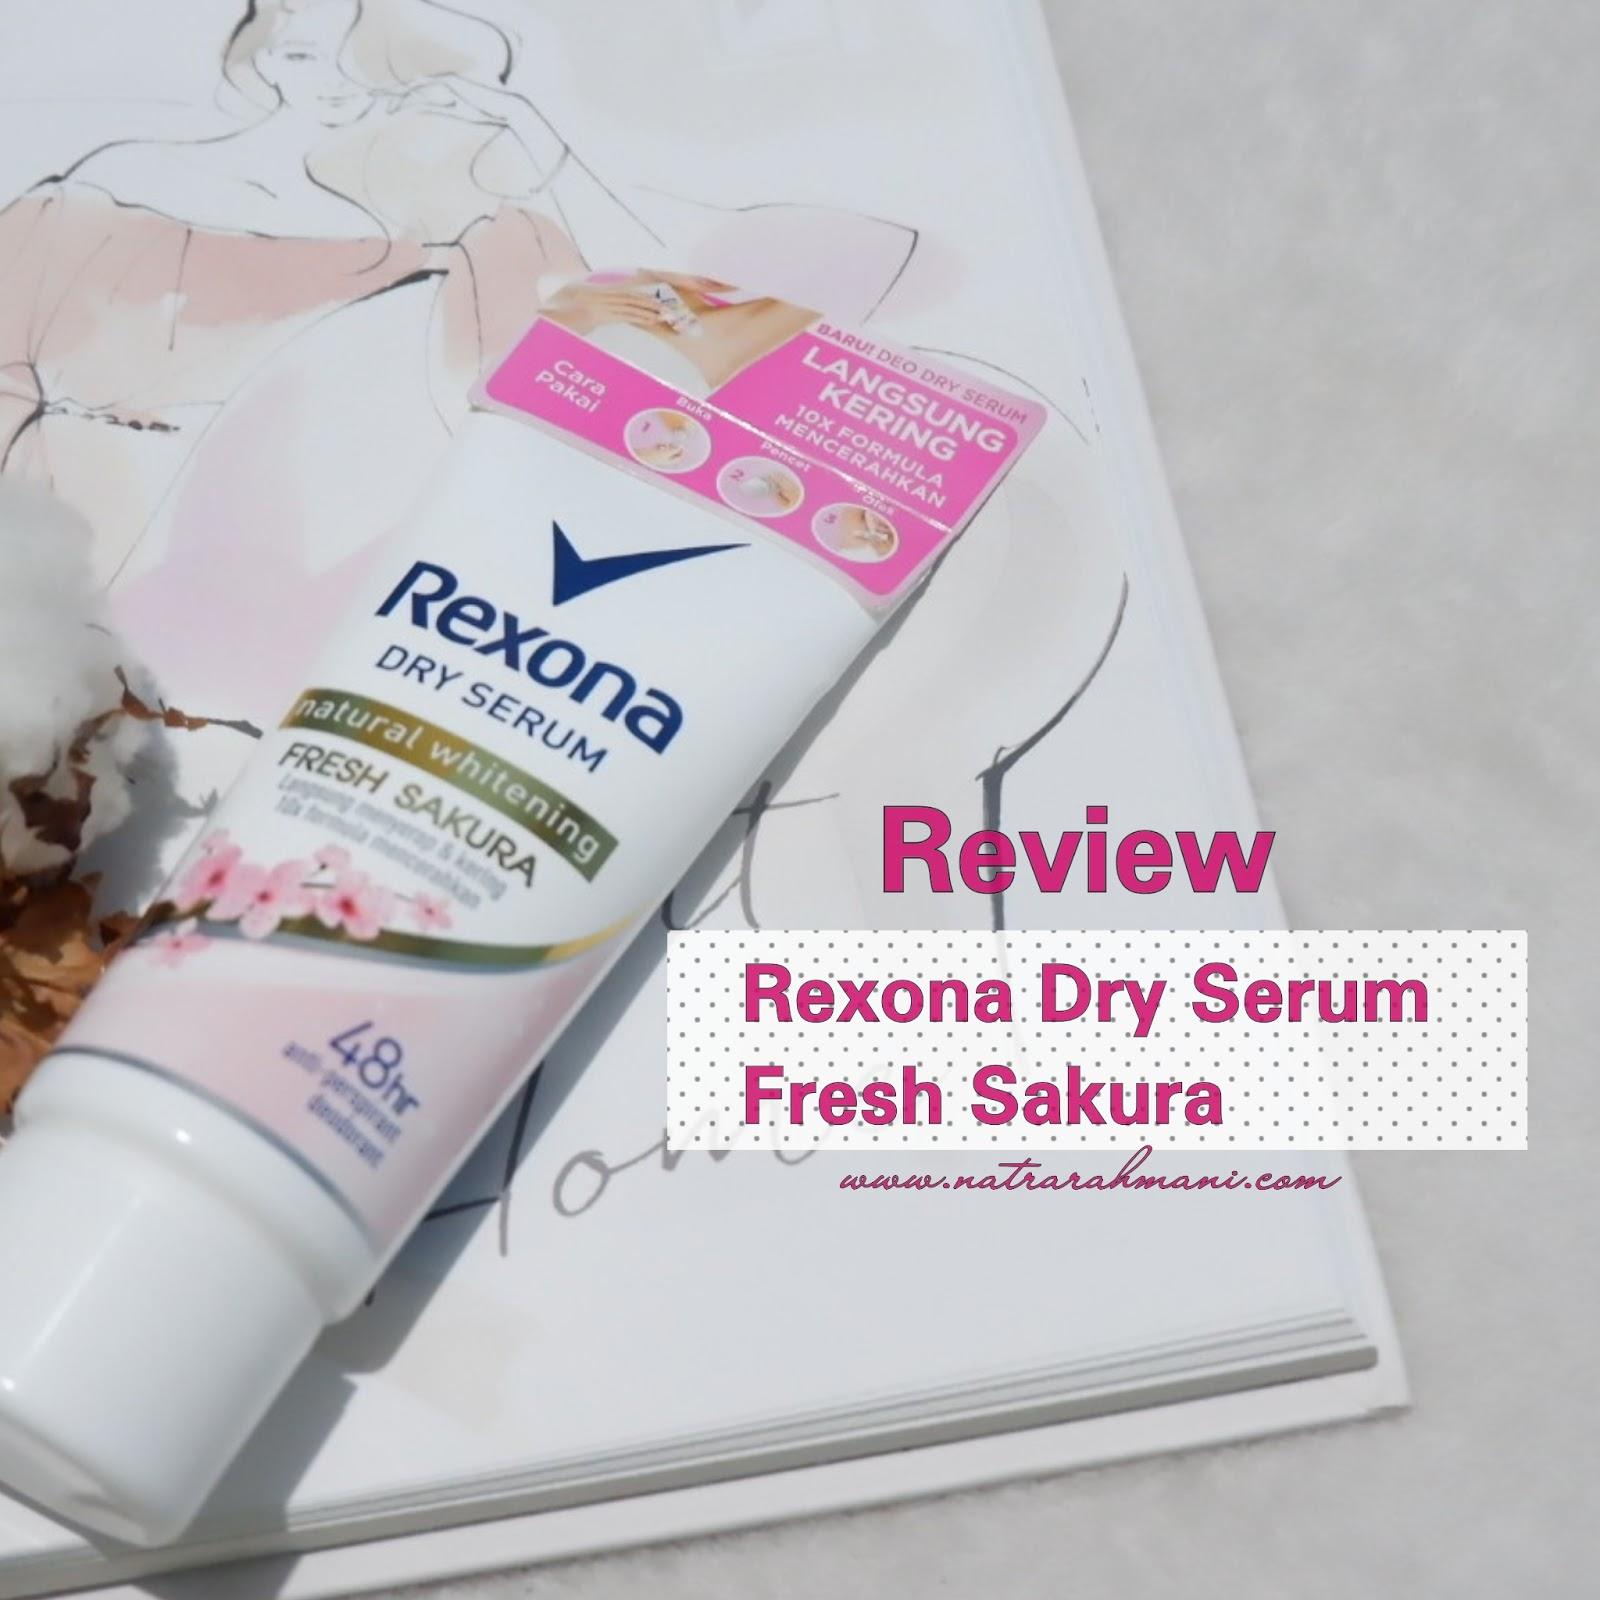 review-rexona-dry-serum-fresh-sakura-natrarahmani